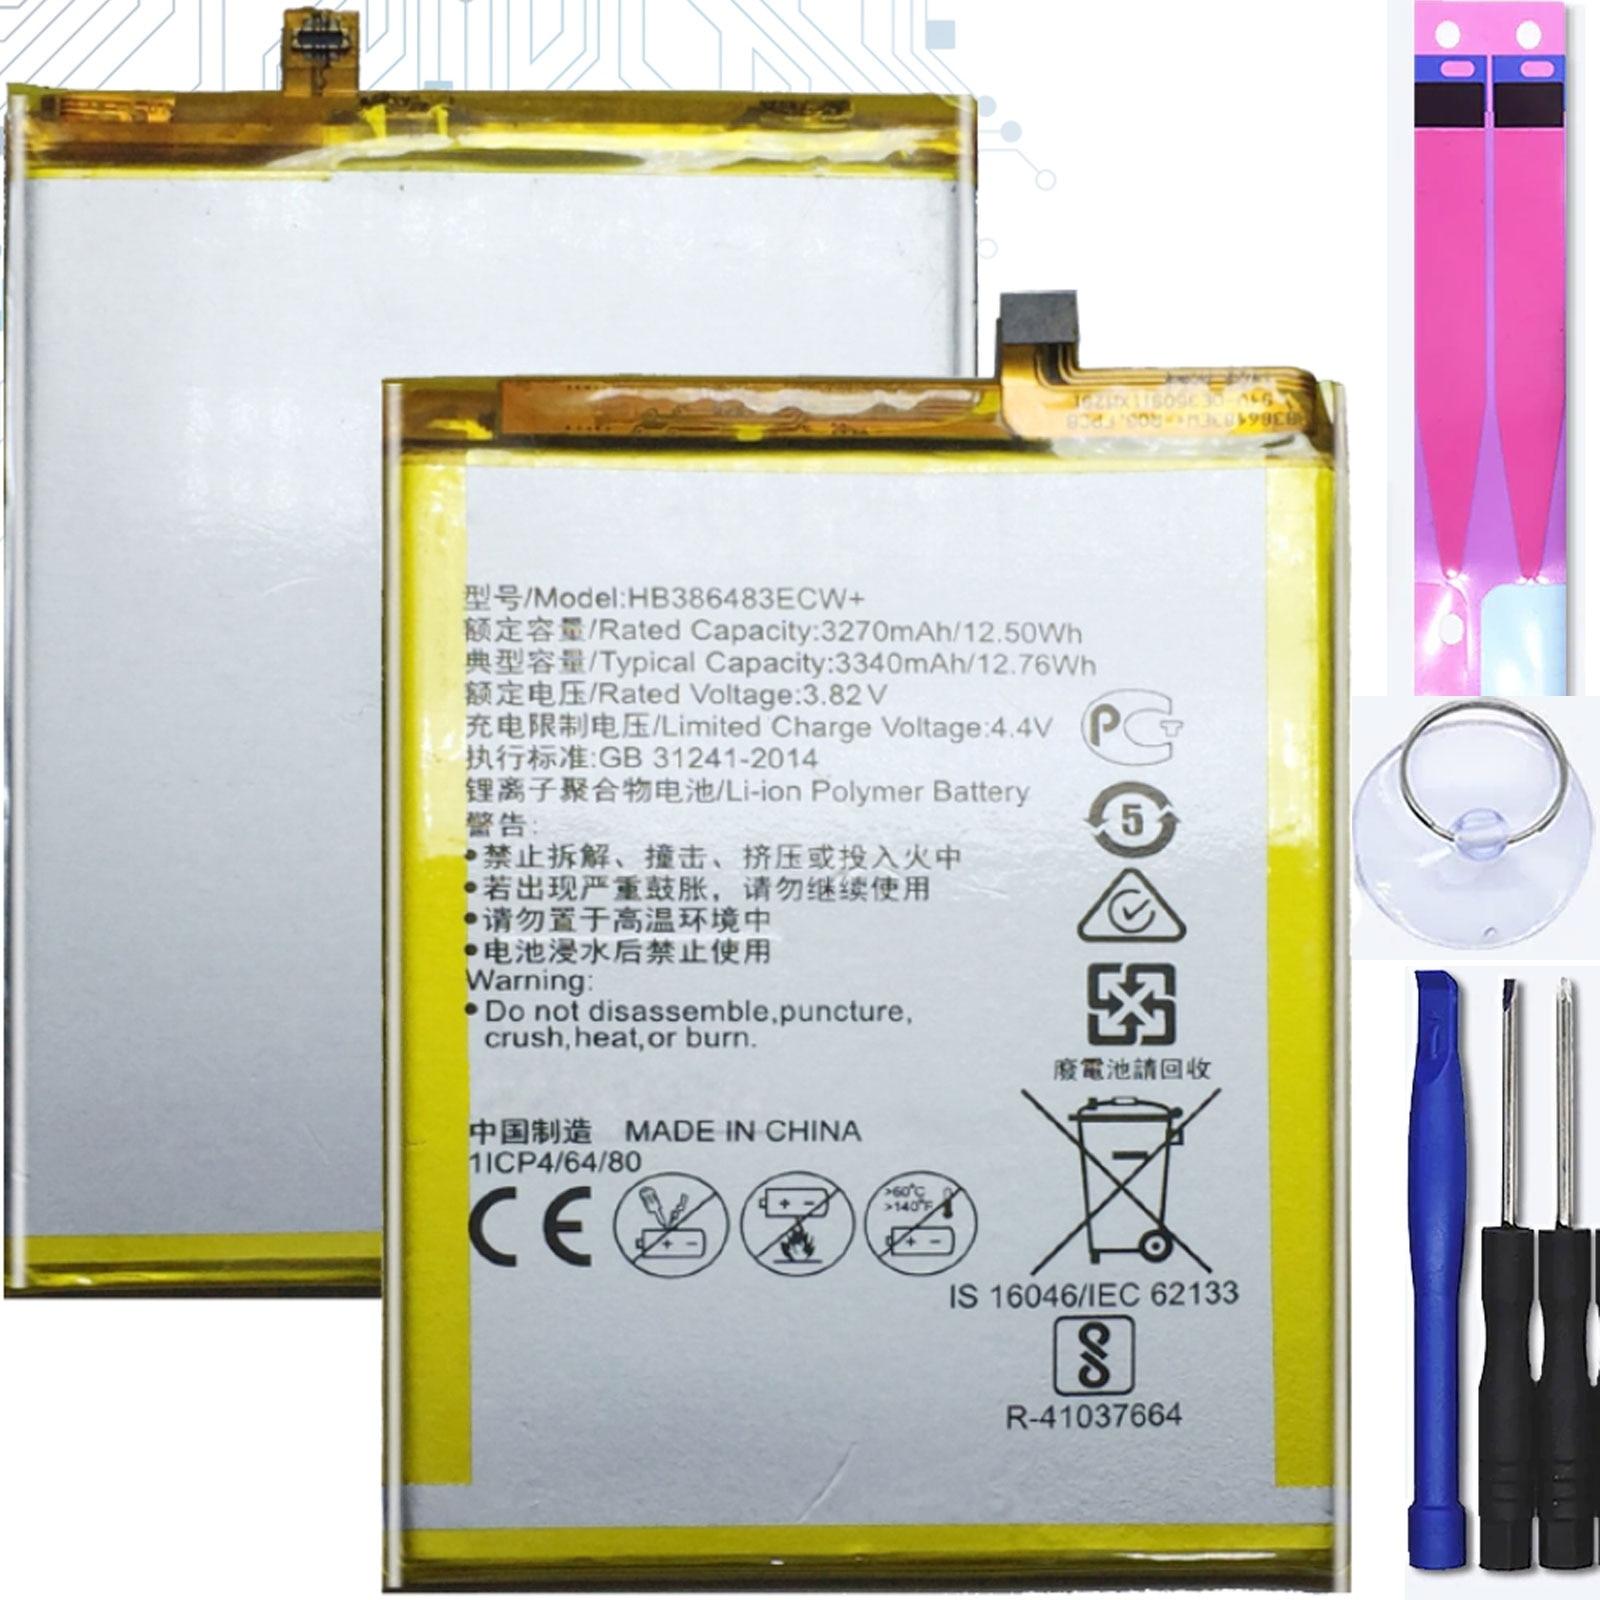 Аккумулятор для Huawei Honor 6X 6C Enjoy 6S, G9 Nova Plus, Mpn оригинальный Hb386483Ecw|Аккумуляторы для мобильных телефонов|   | АлиЭкспресс